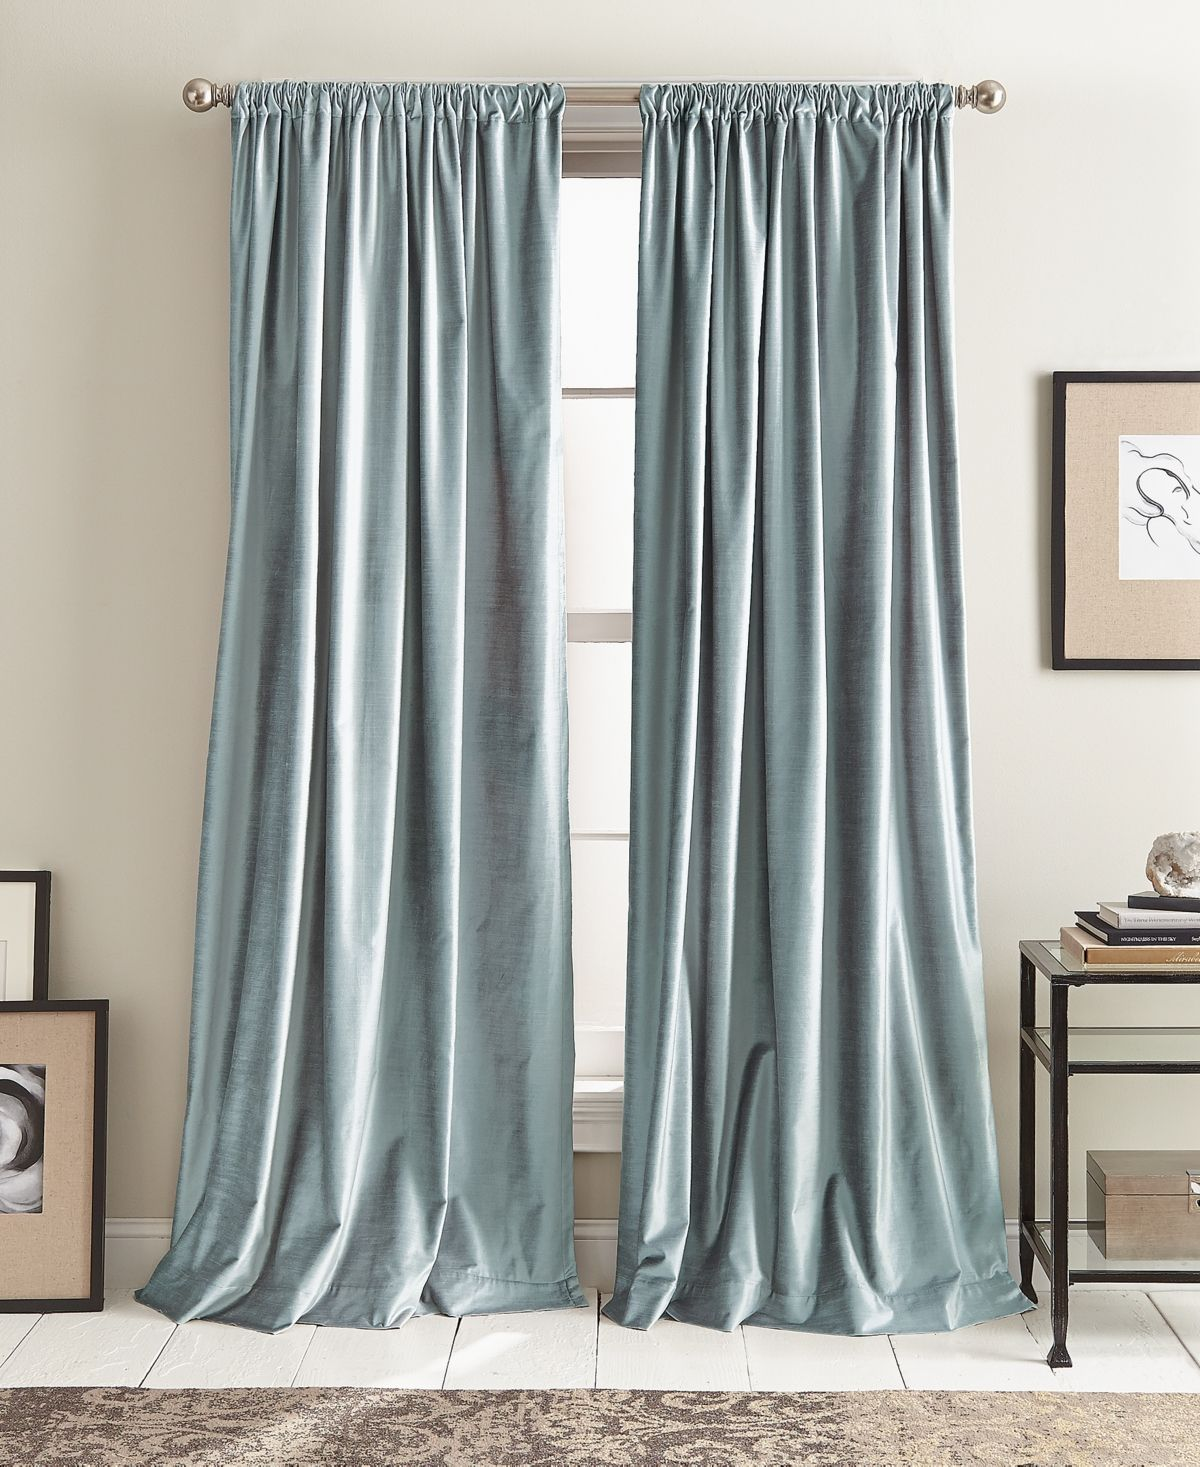 Dkny Modern Textured Velvet 50 X 108 Pole Top Pair Of Window Panels Reviews Window Treatments Blinds Macy S